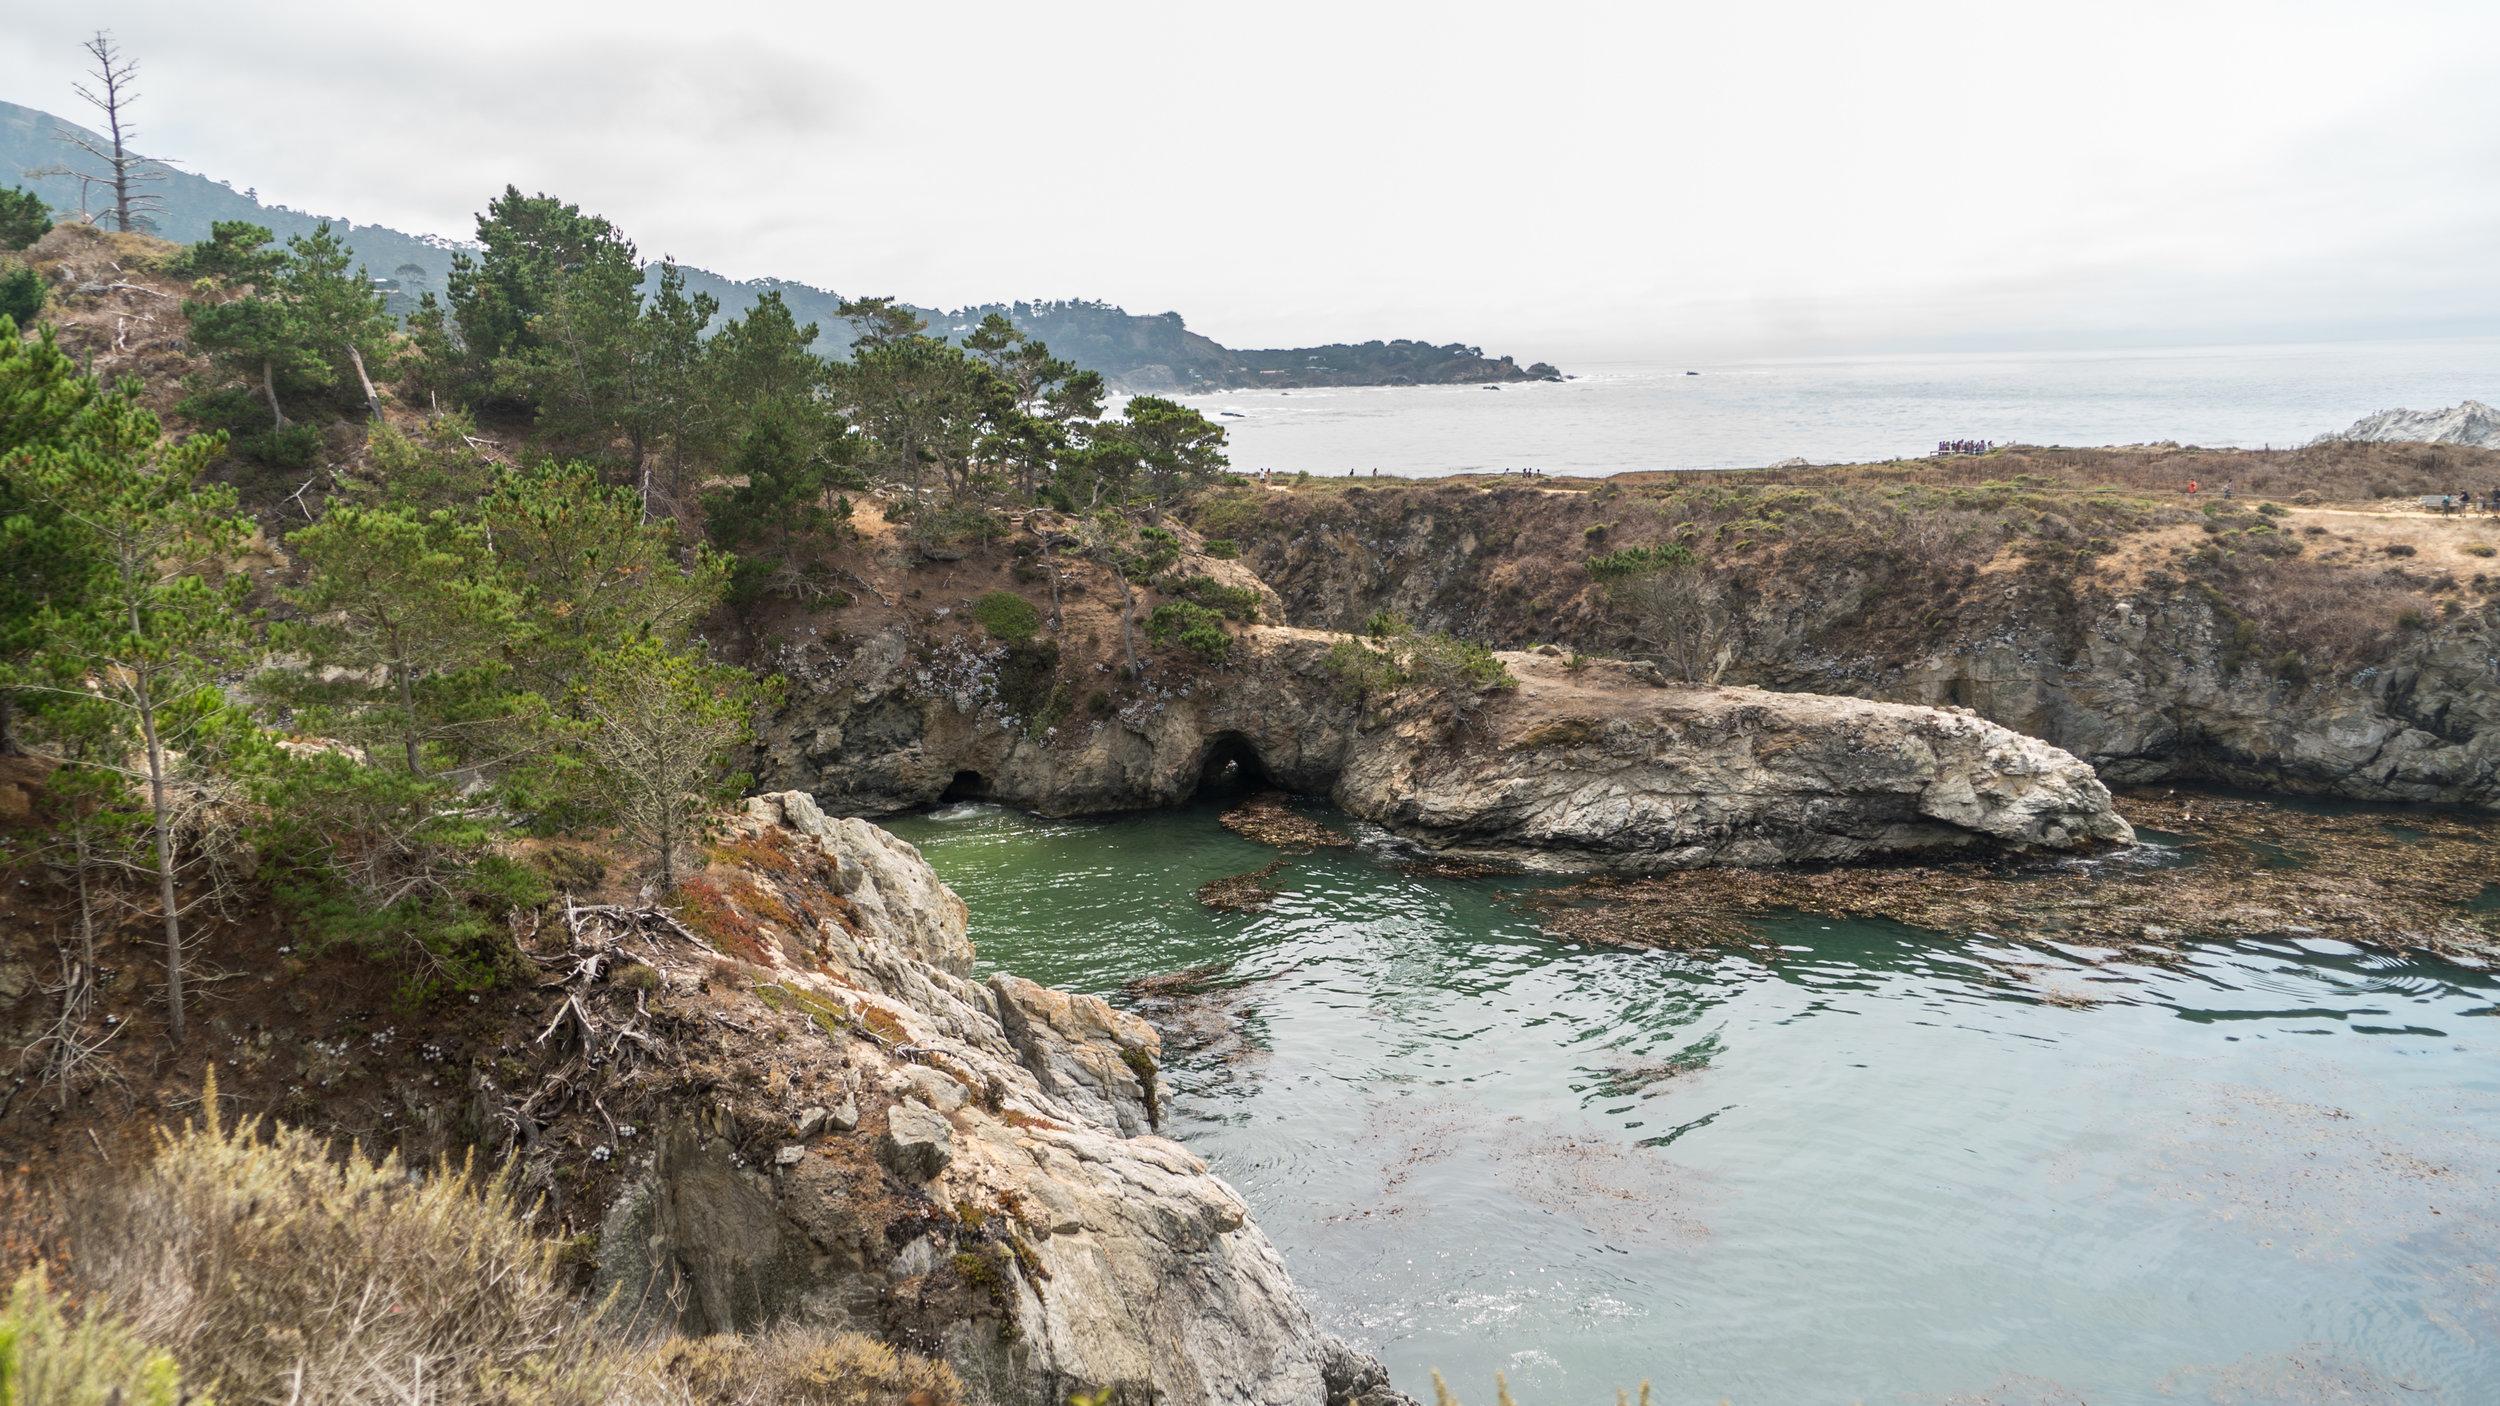 2017-09-09_IGSM_Monterey_Trip_DSC06858.jpg